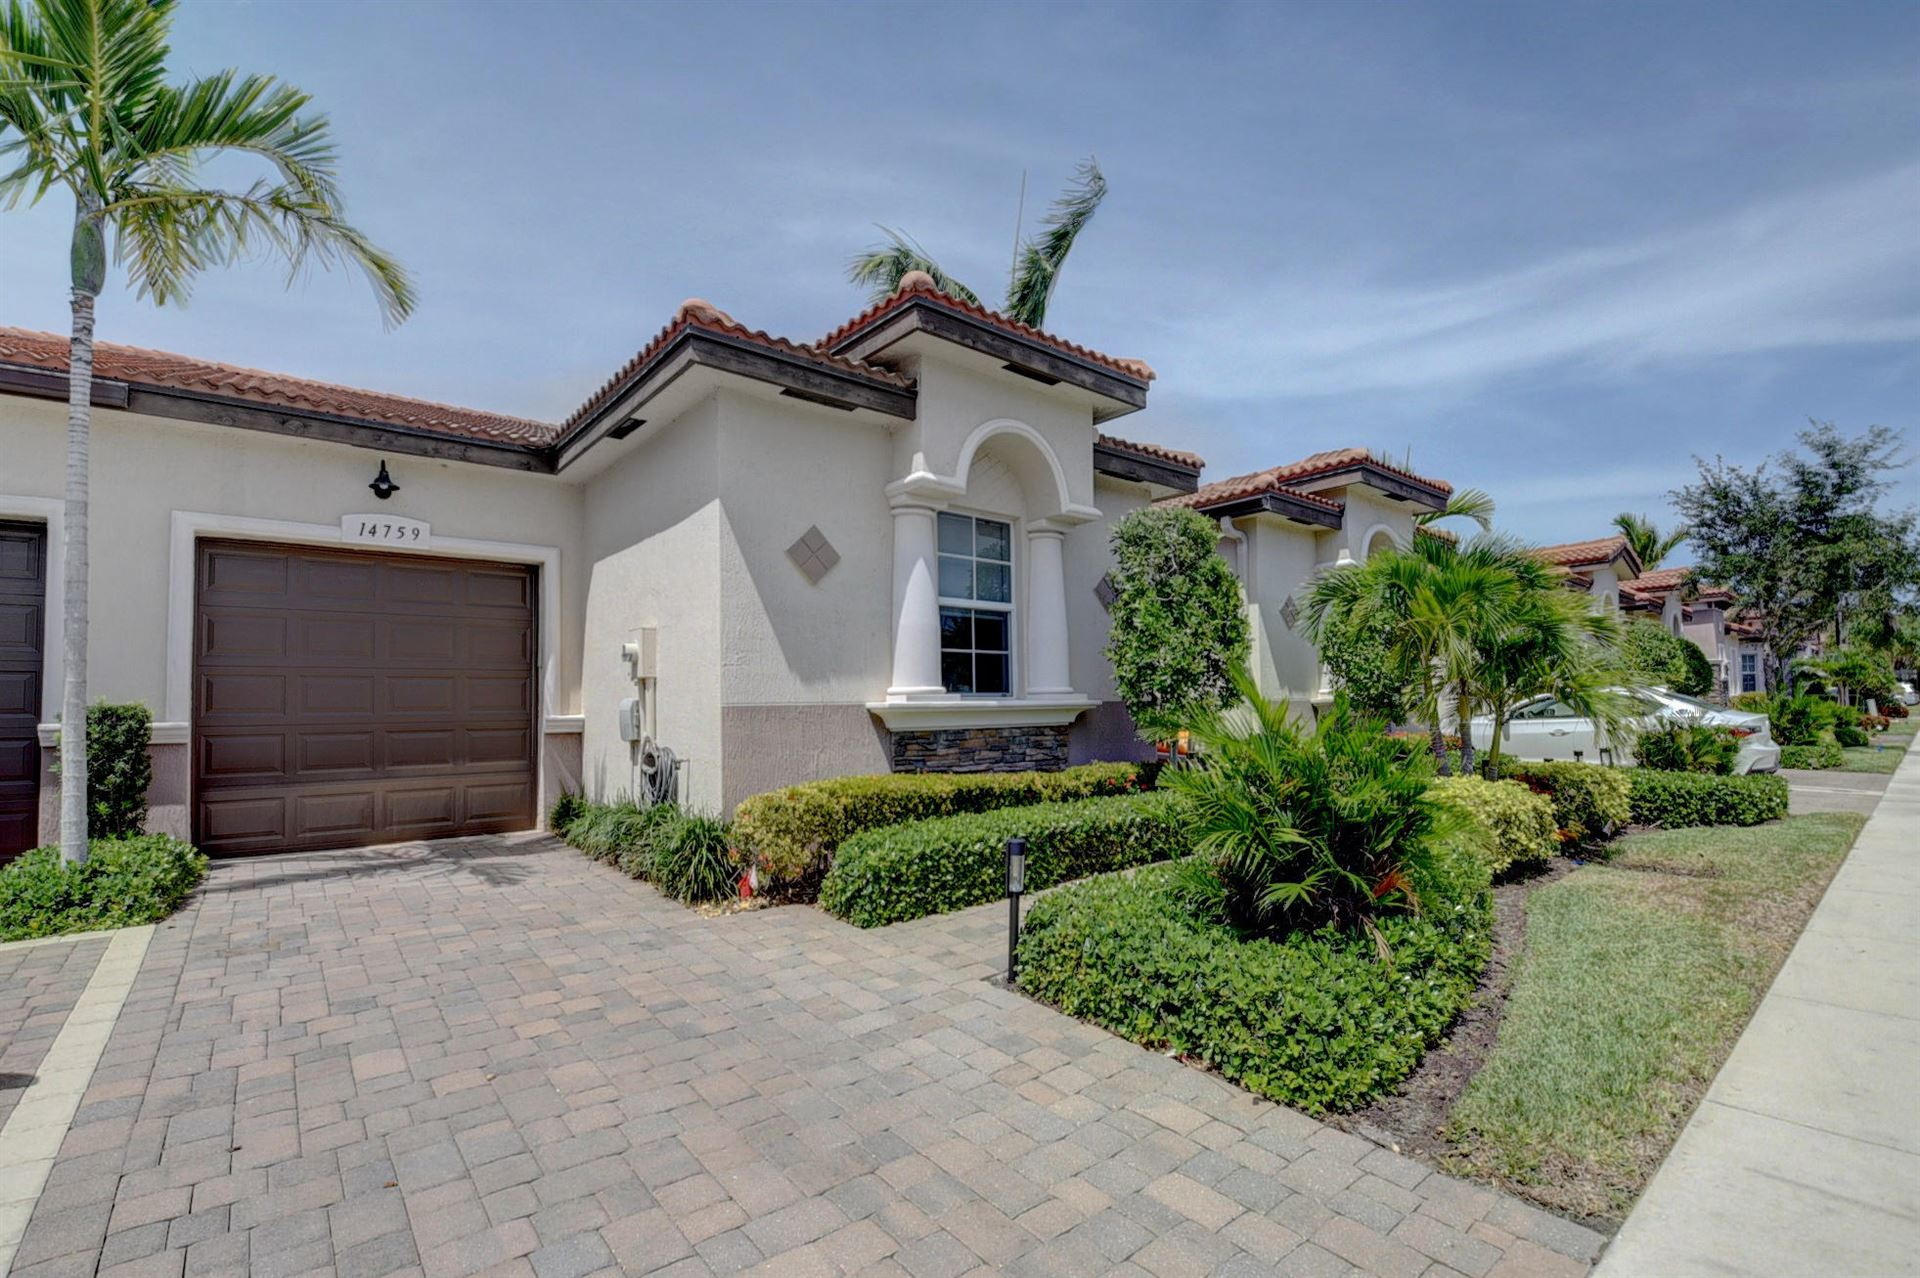 14759 Barletta Way, Delray Beach, FL 33446 - MLS#: RX-10712433